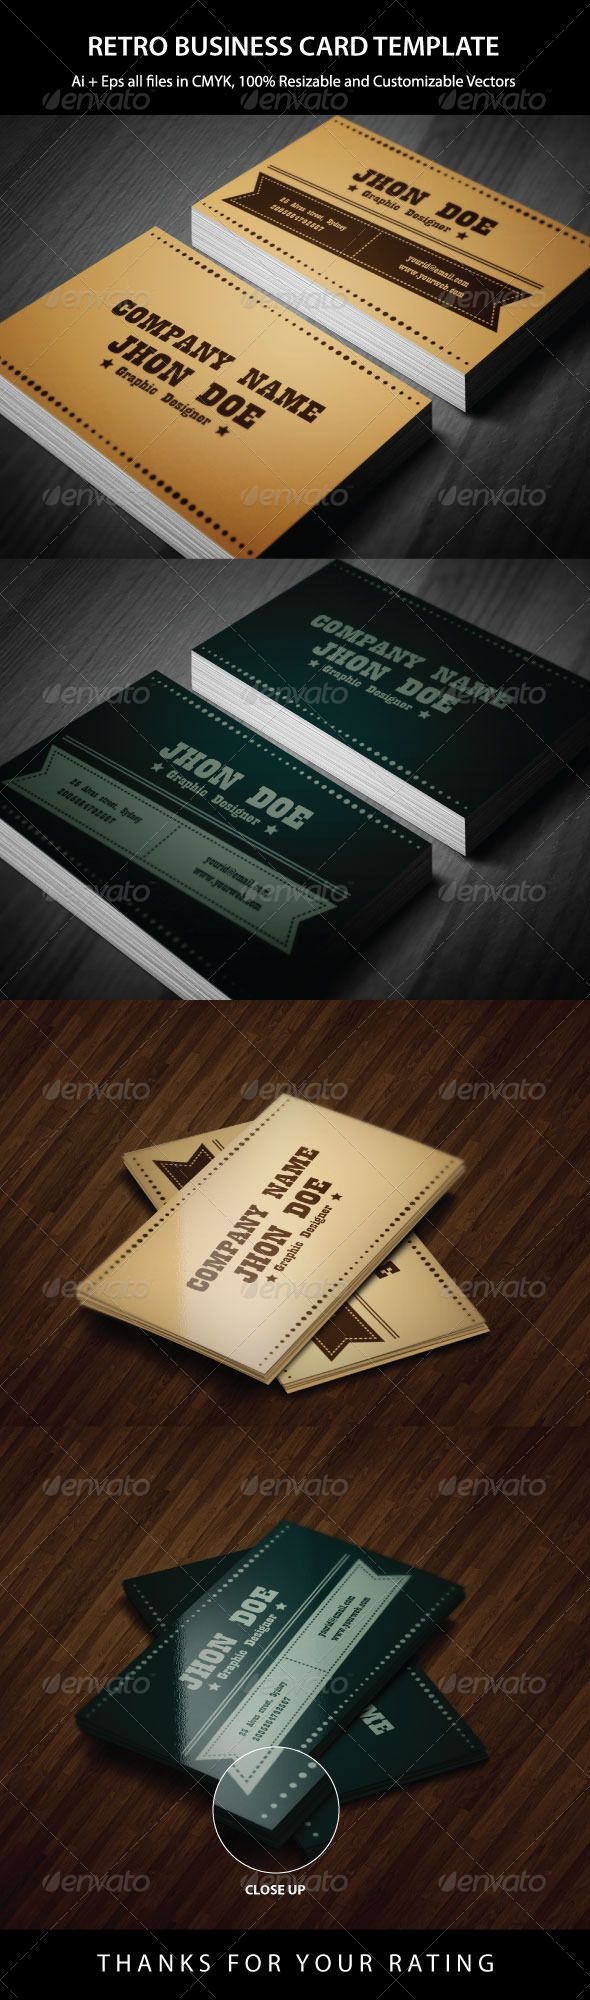 Exclusive Retro Business Card Retro Business Card Vintage Business Cards Personal Business Cards Design